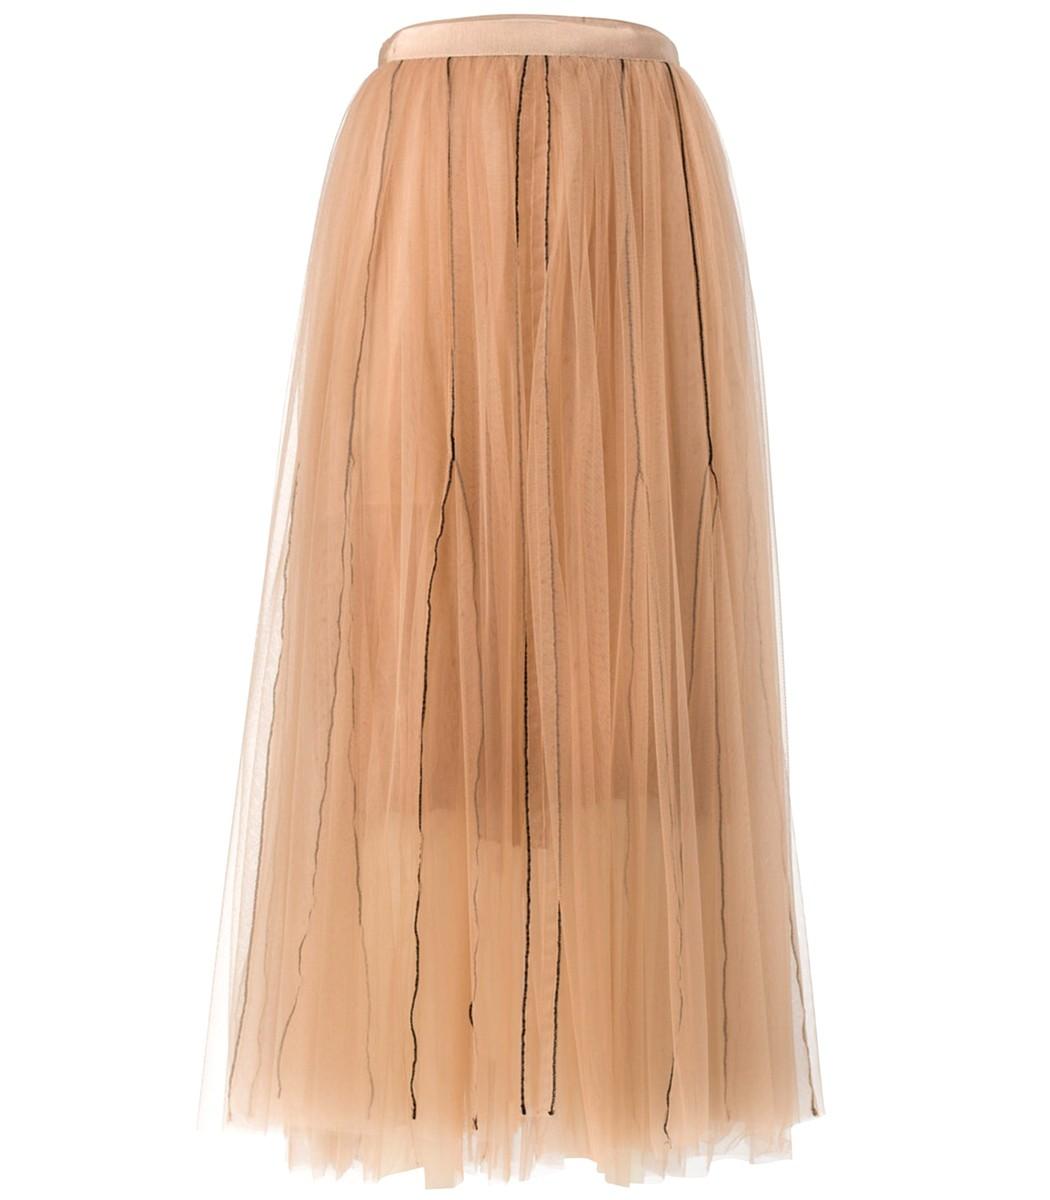 Brown Muted Hazelnut Sensitive Transparency Layered Skirt